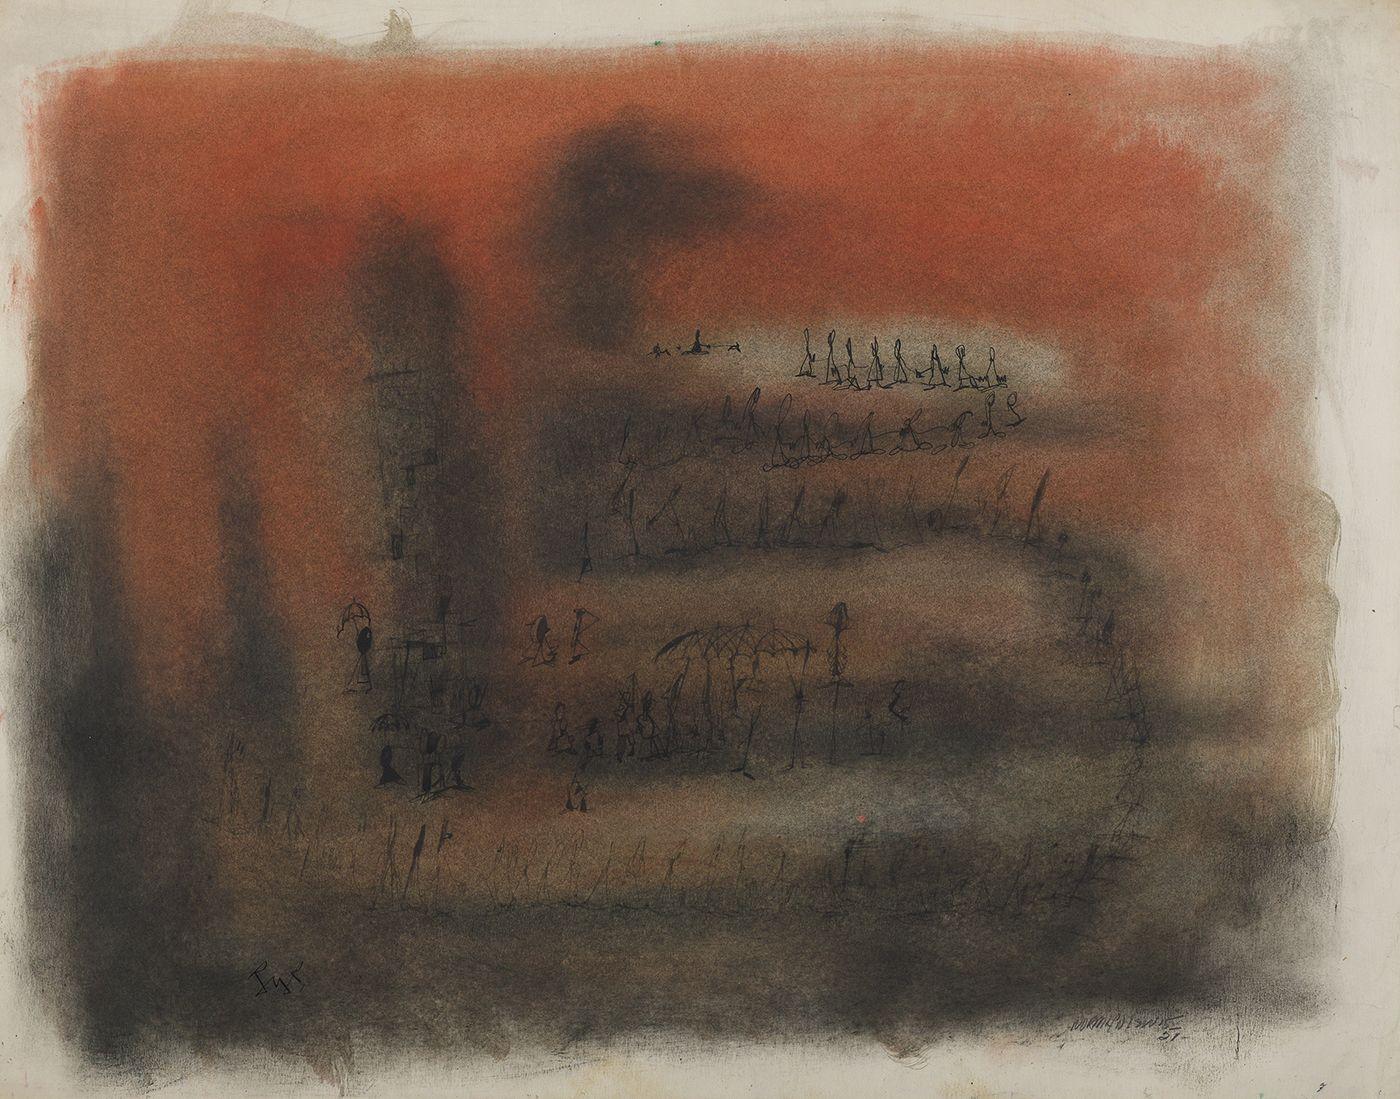 Norman Lewis (1909-1979), Figures on an Orange Ground, 1951